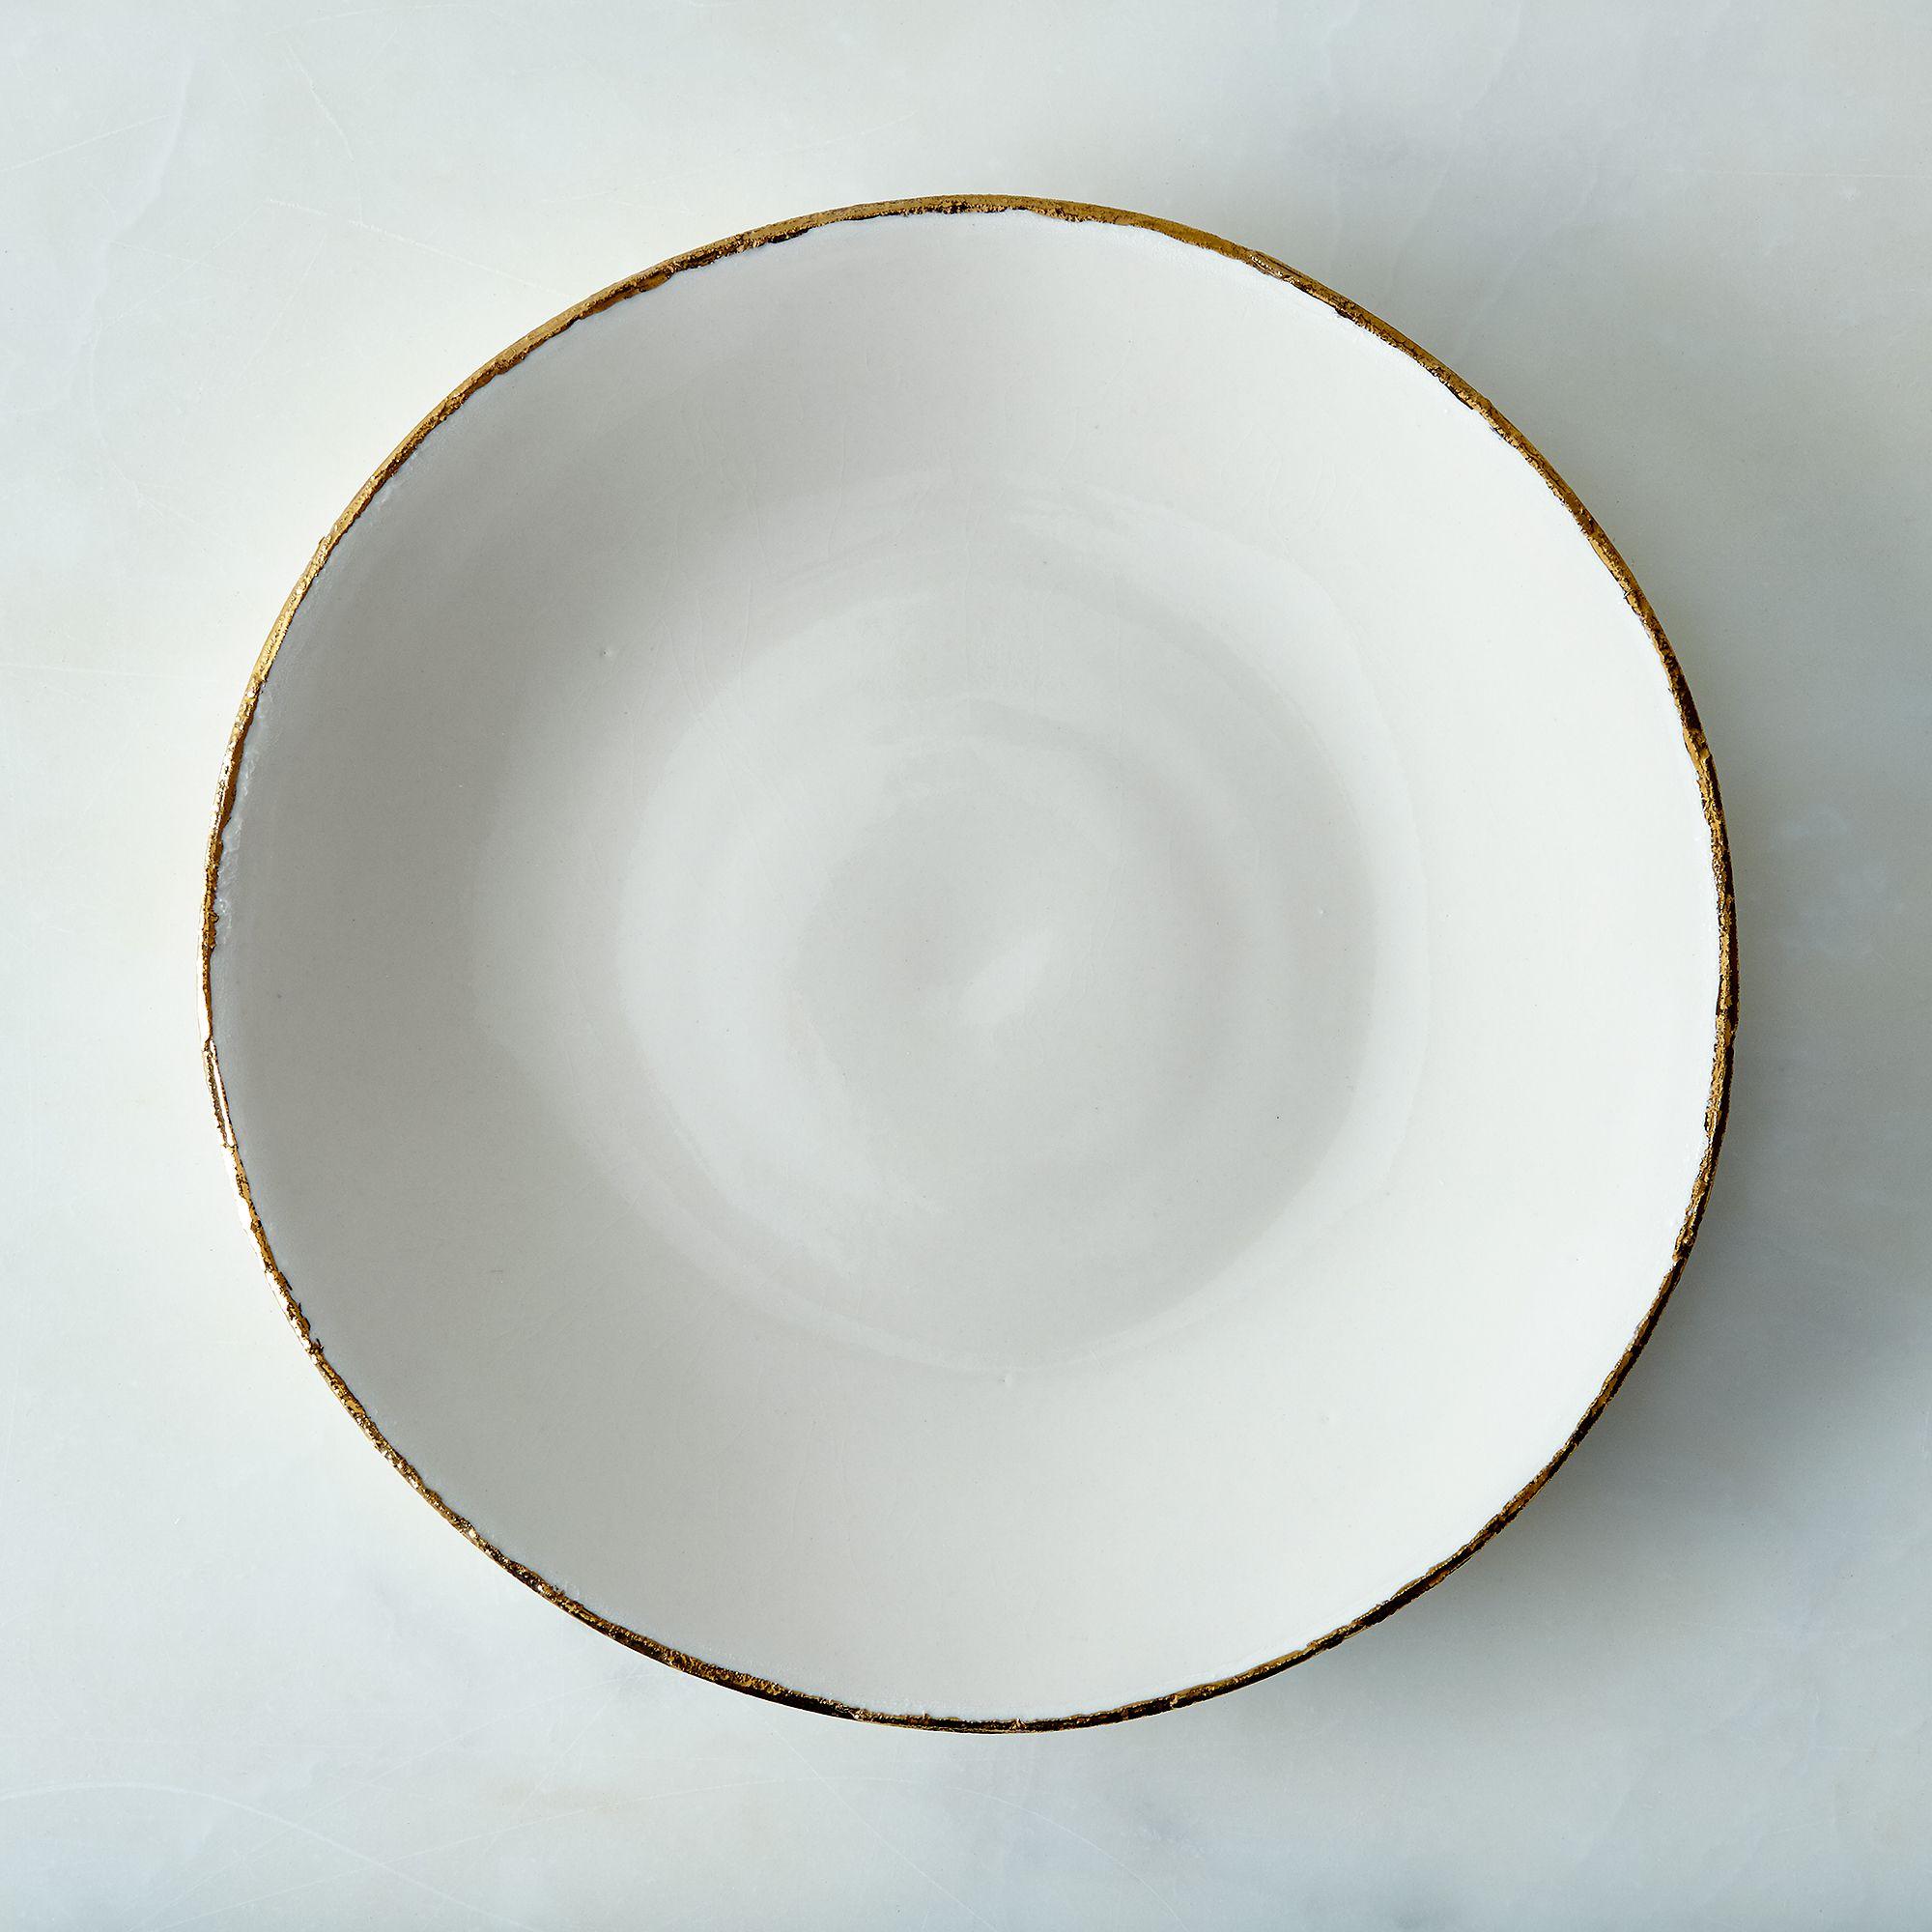 F328d95b acf4 4a1e a468 683597b7b58e  2016 0328 sarah cihat edge porcelain gold rimmed dinnerware ivory dinner plate silo rocky luten 004